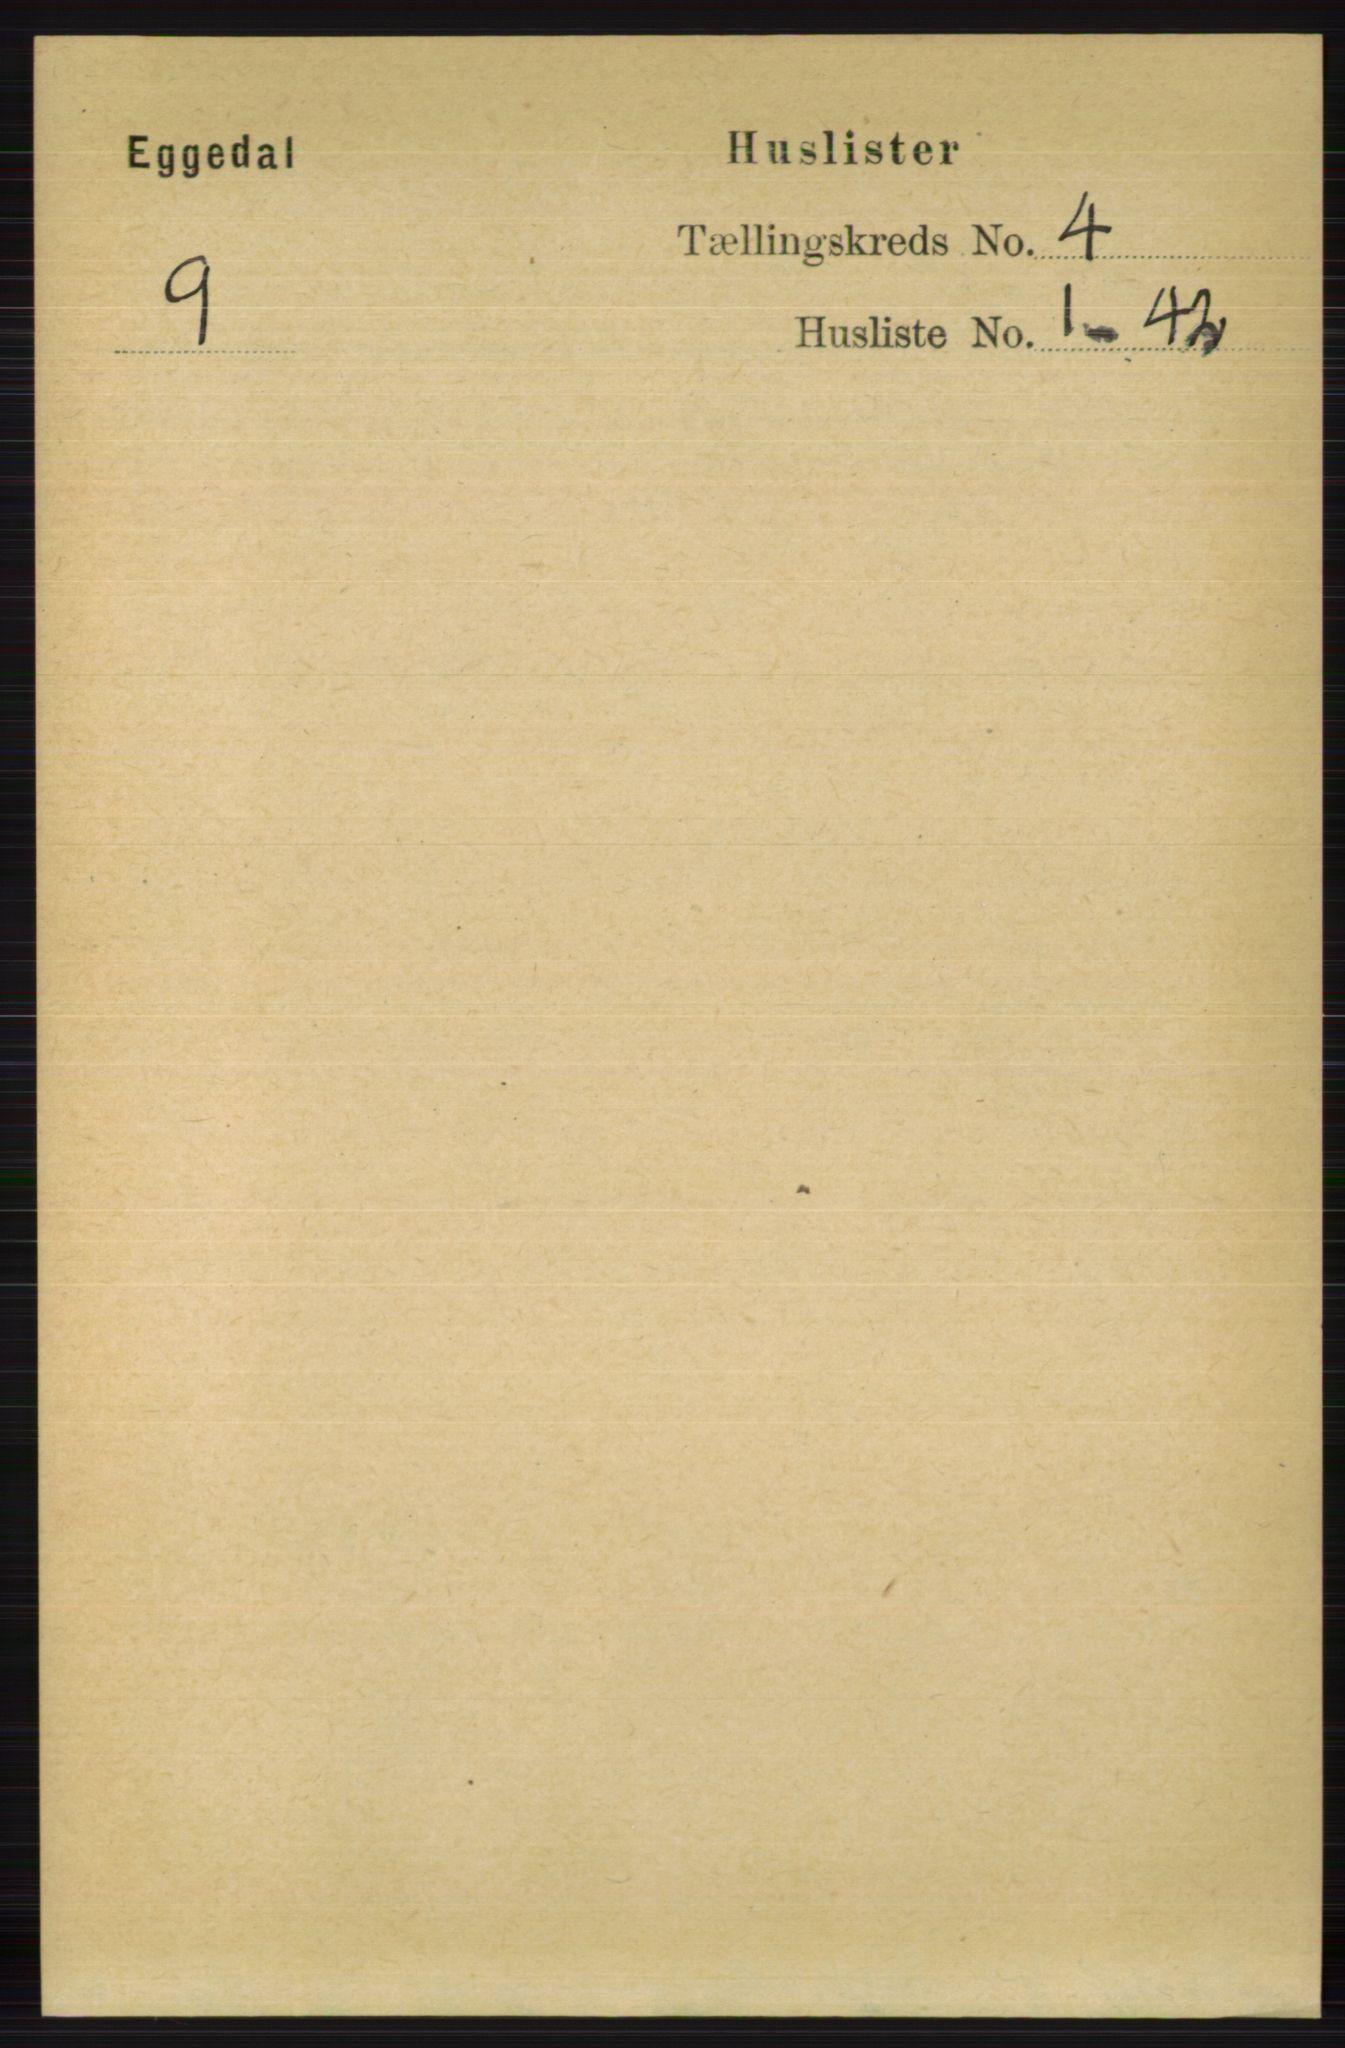 RA, Folketelling 1891 for 0621 Sigdal herred, 1891, s. 4623